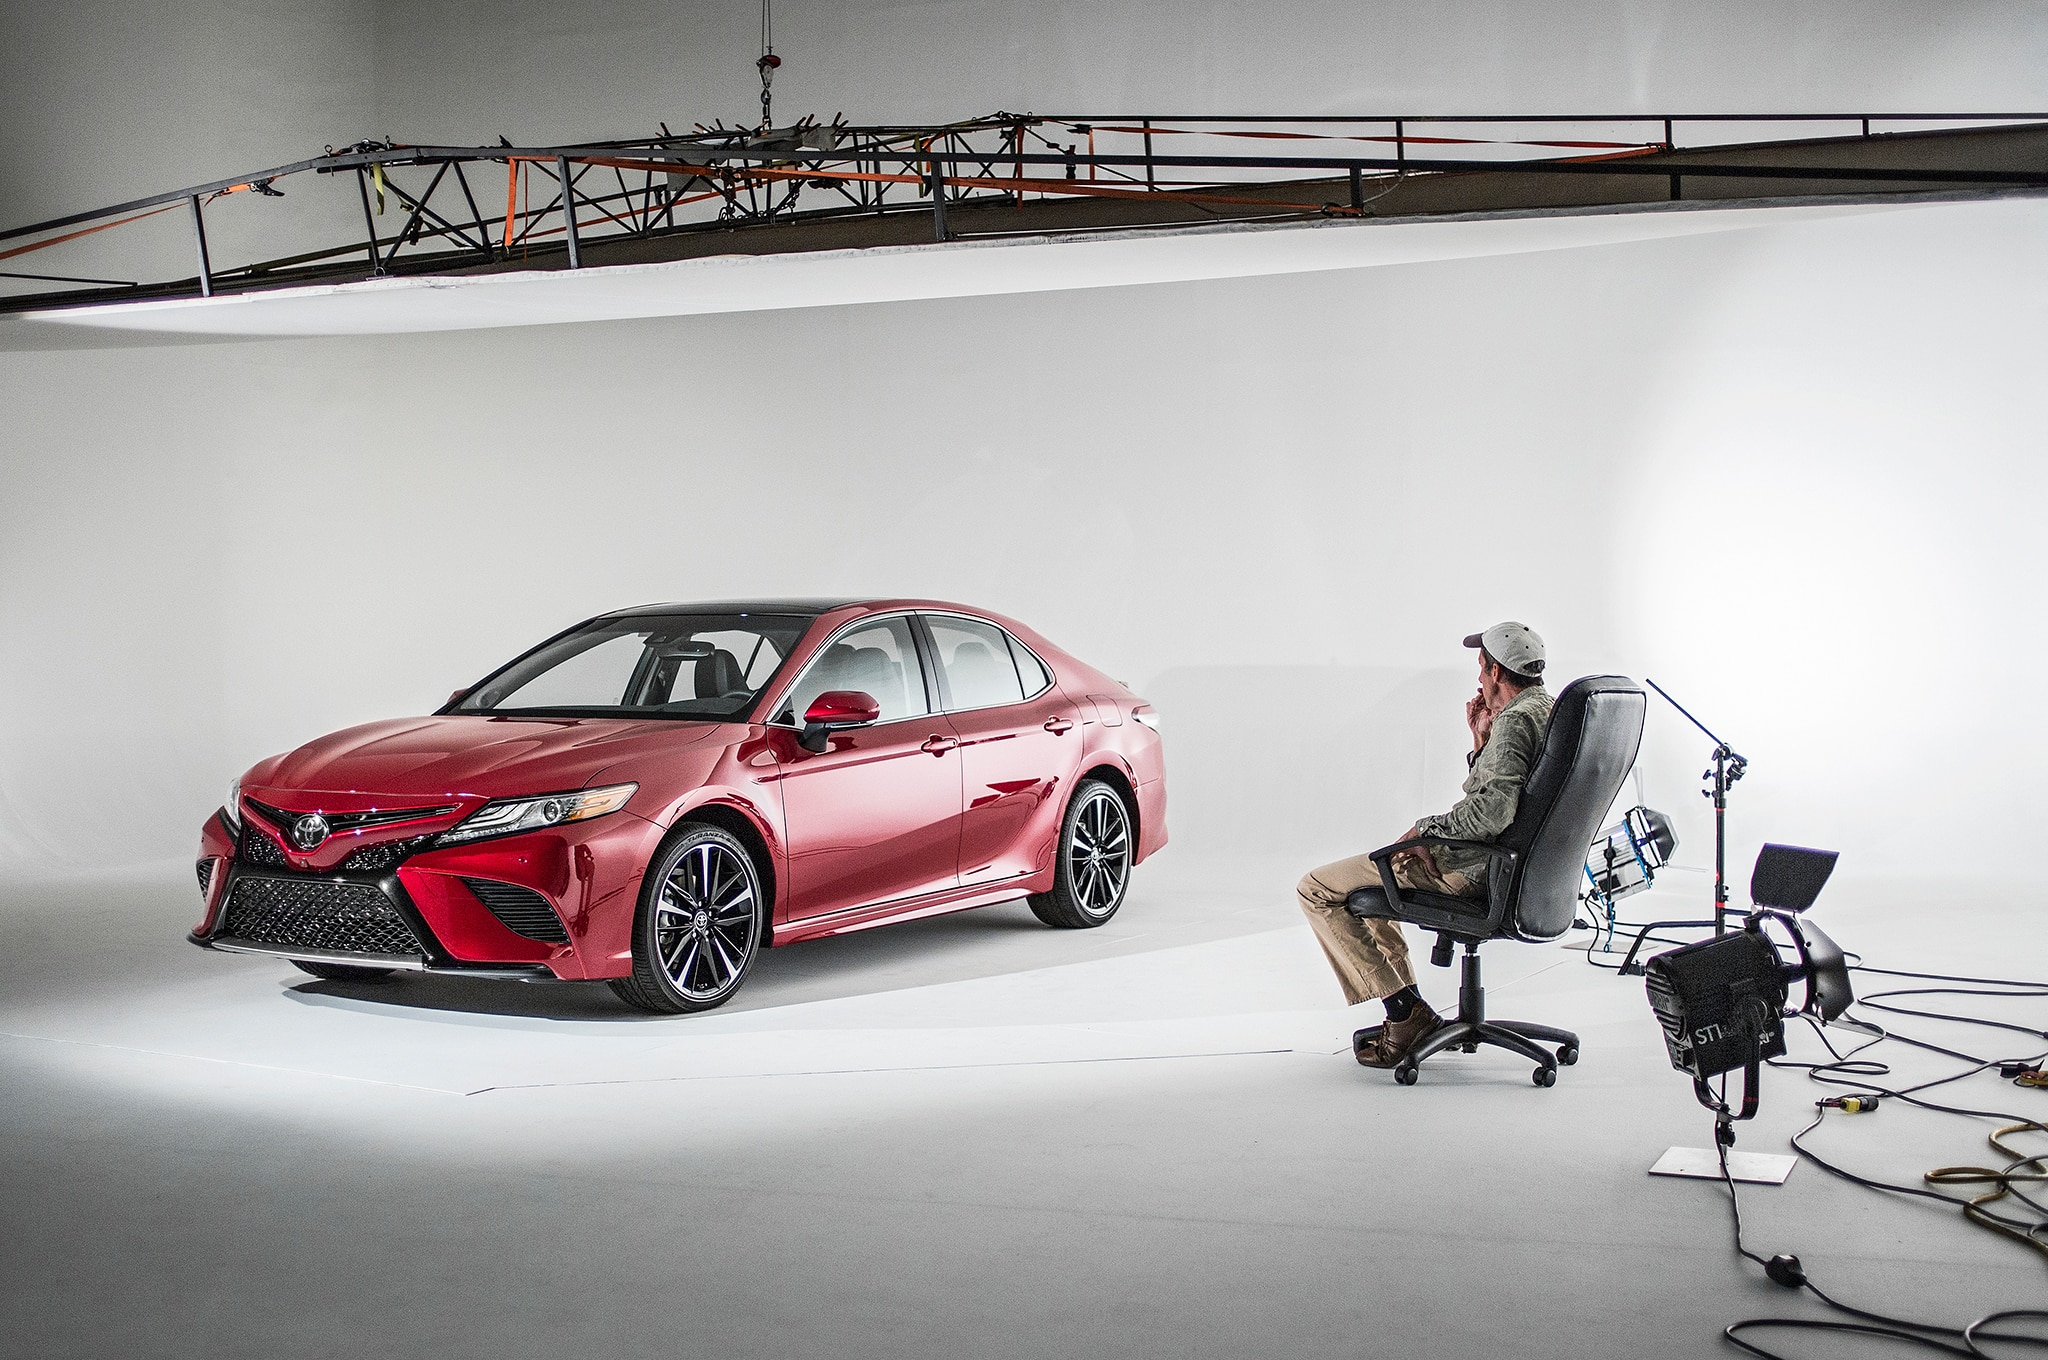 2018 Toyota Camry XSE design